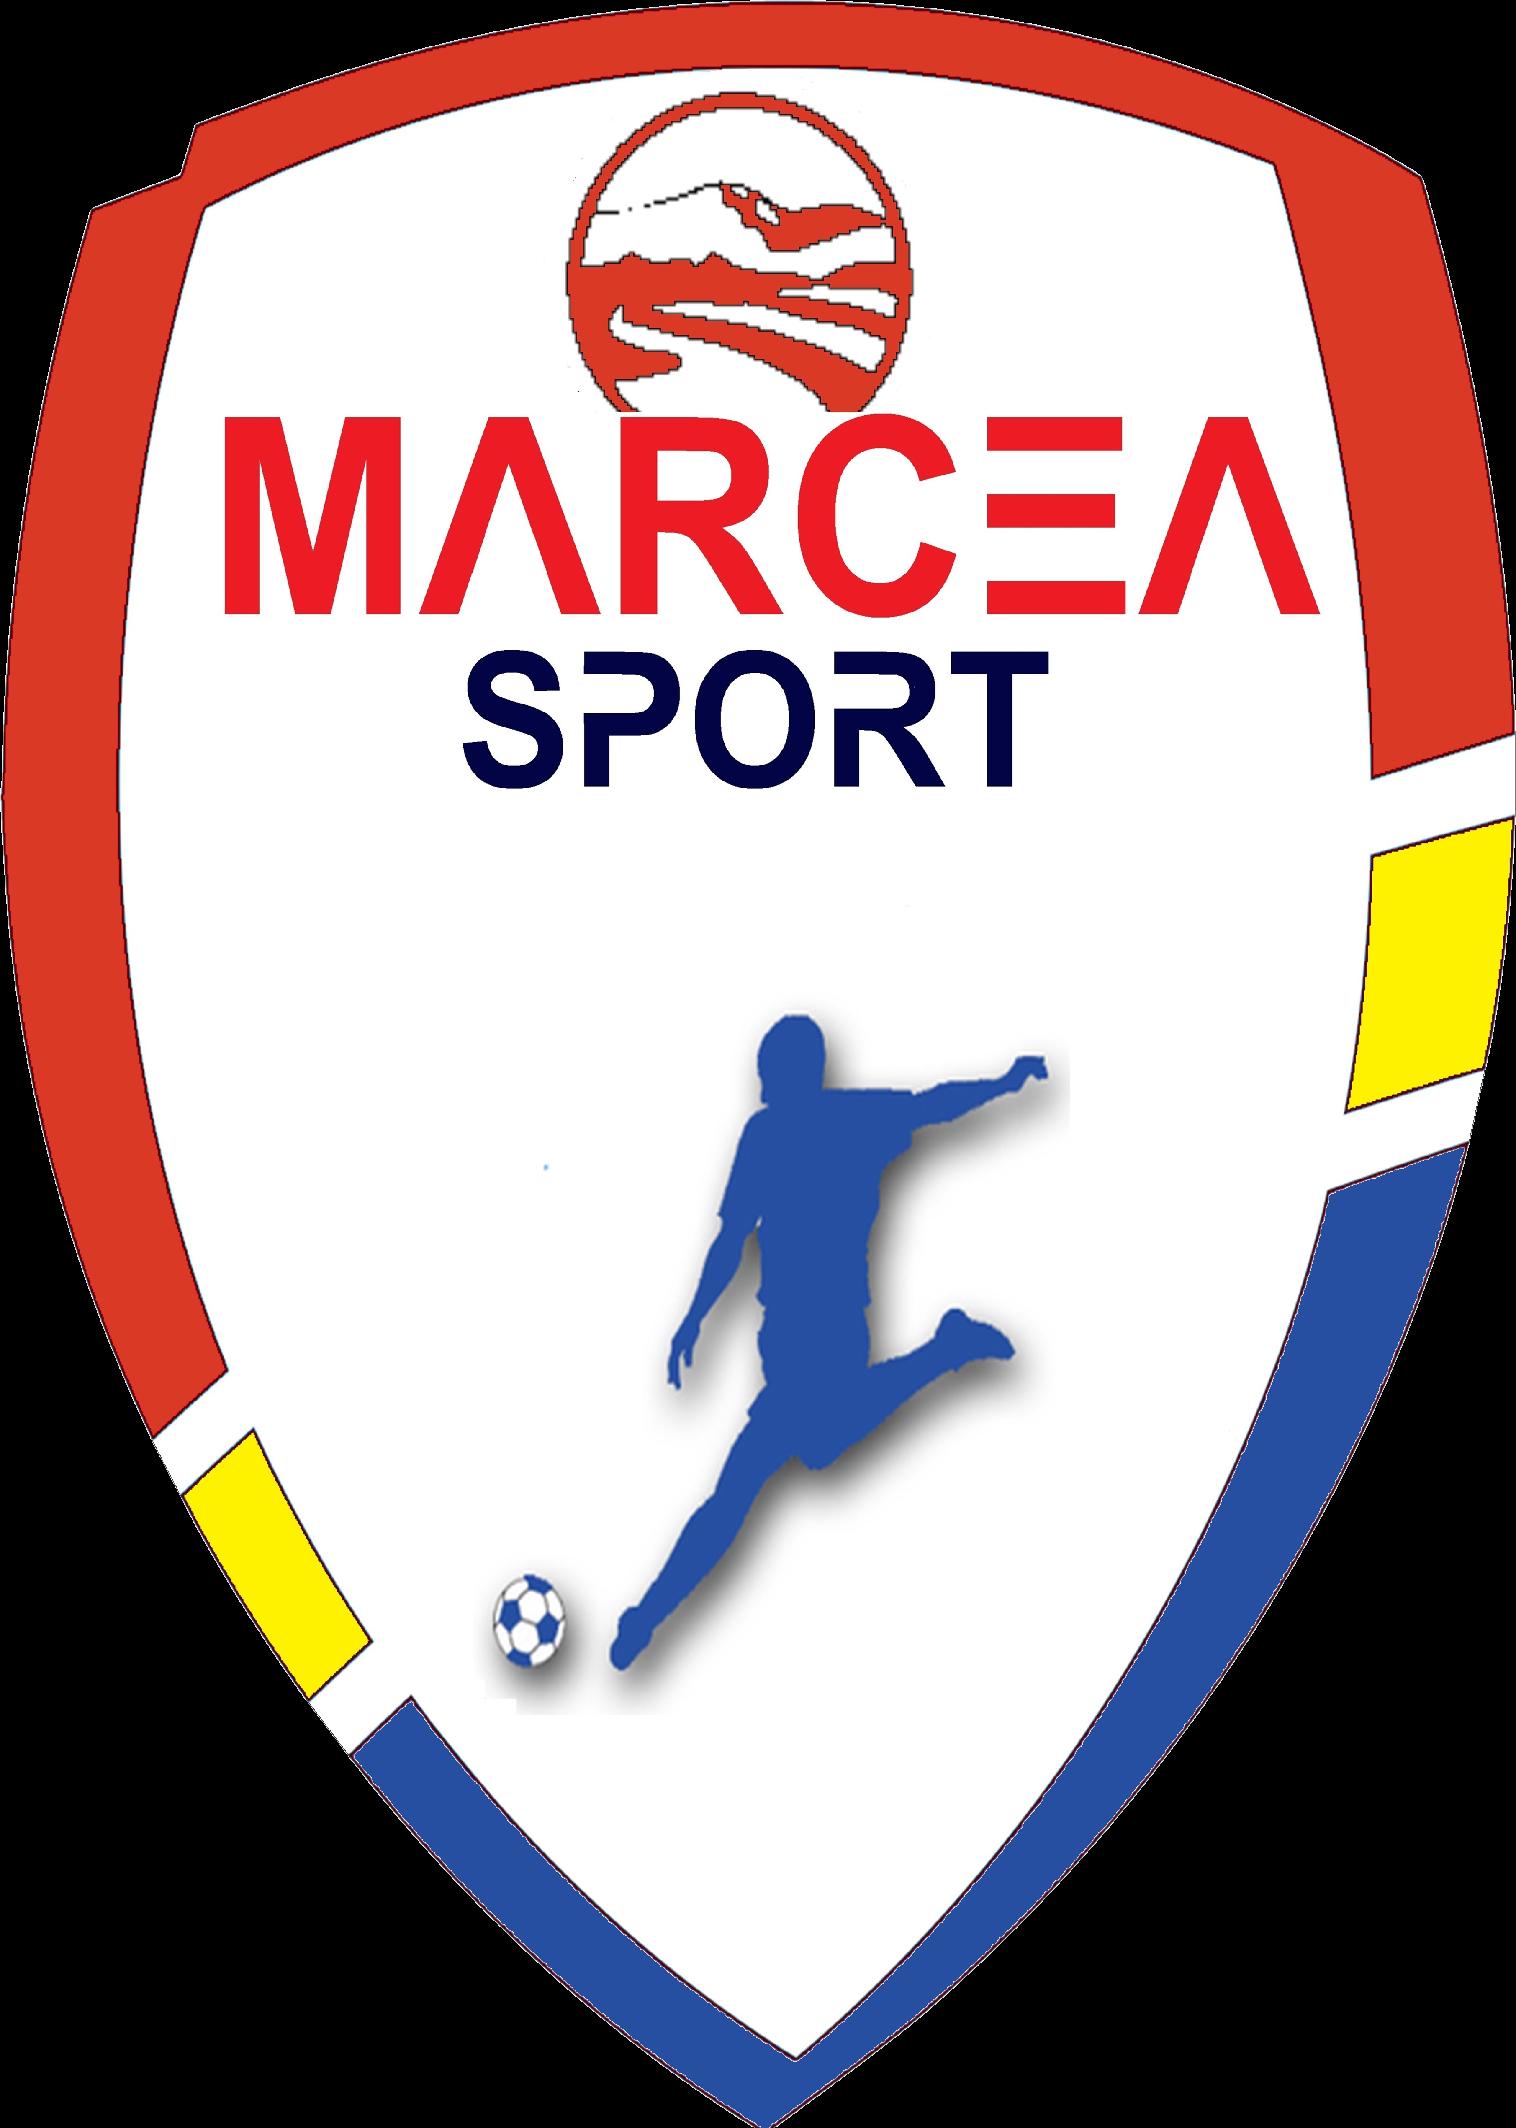 A C S Marcea Sport